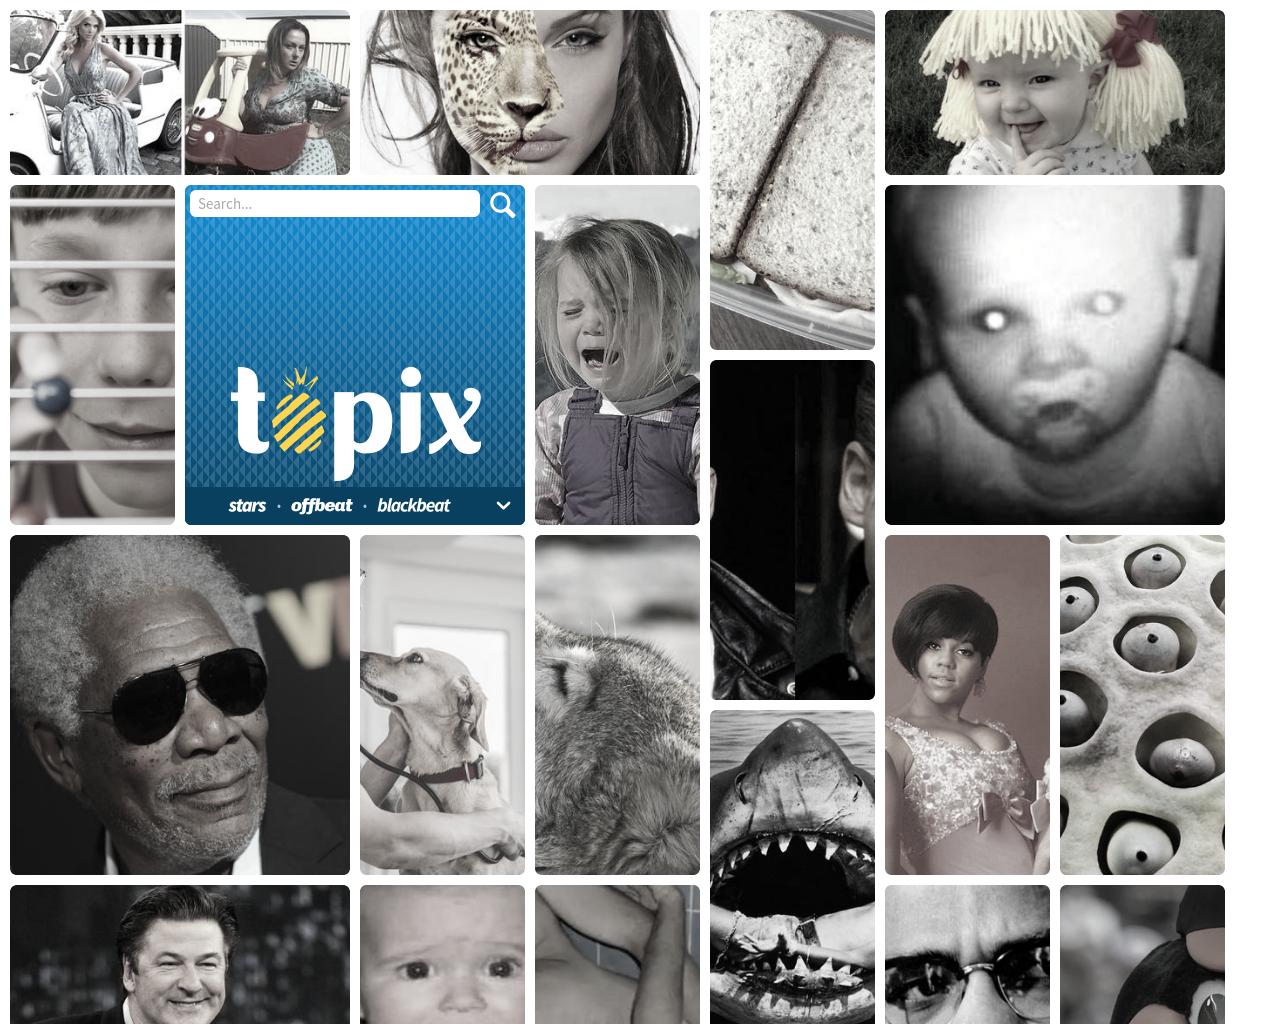 Topix-Advertising-Reviews-Pricing